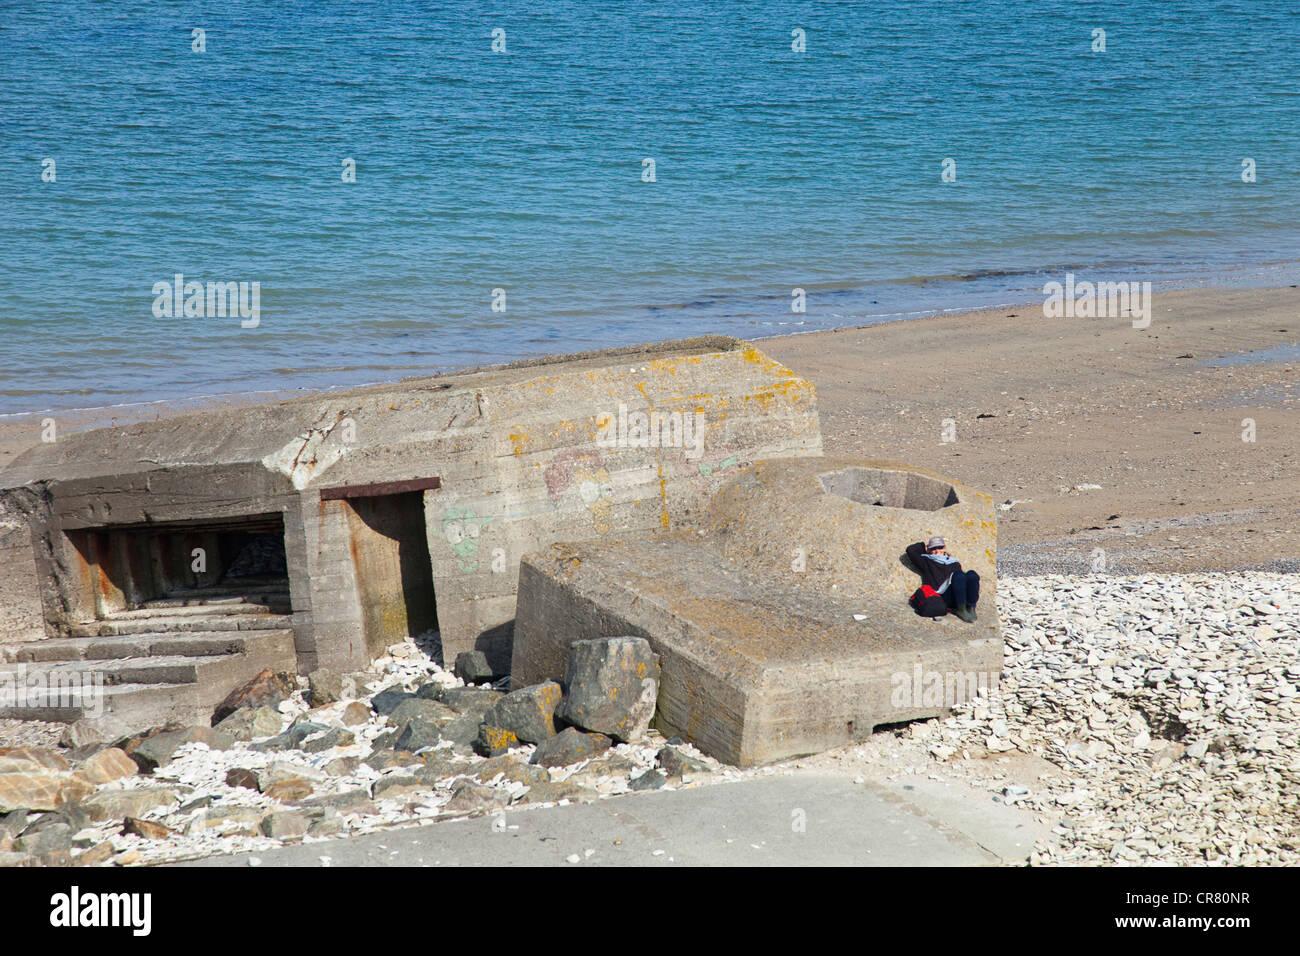 France basse normandie calvados 14 grandcamp maisy bain de stock photo - Bain de soleil solde ...